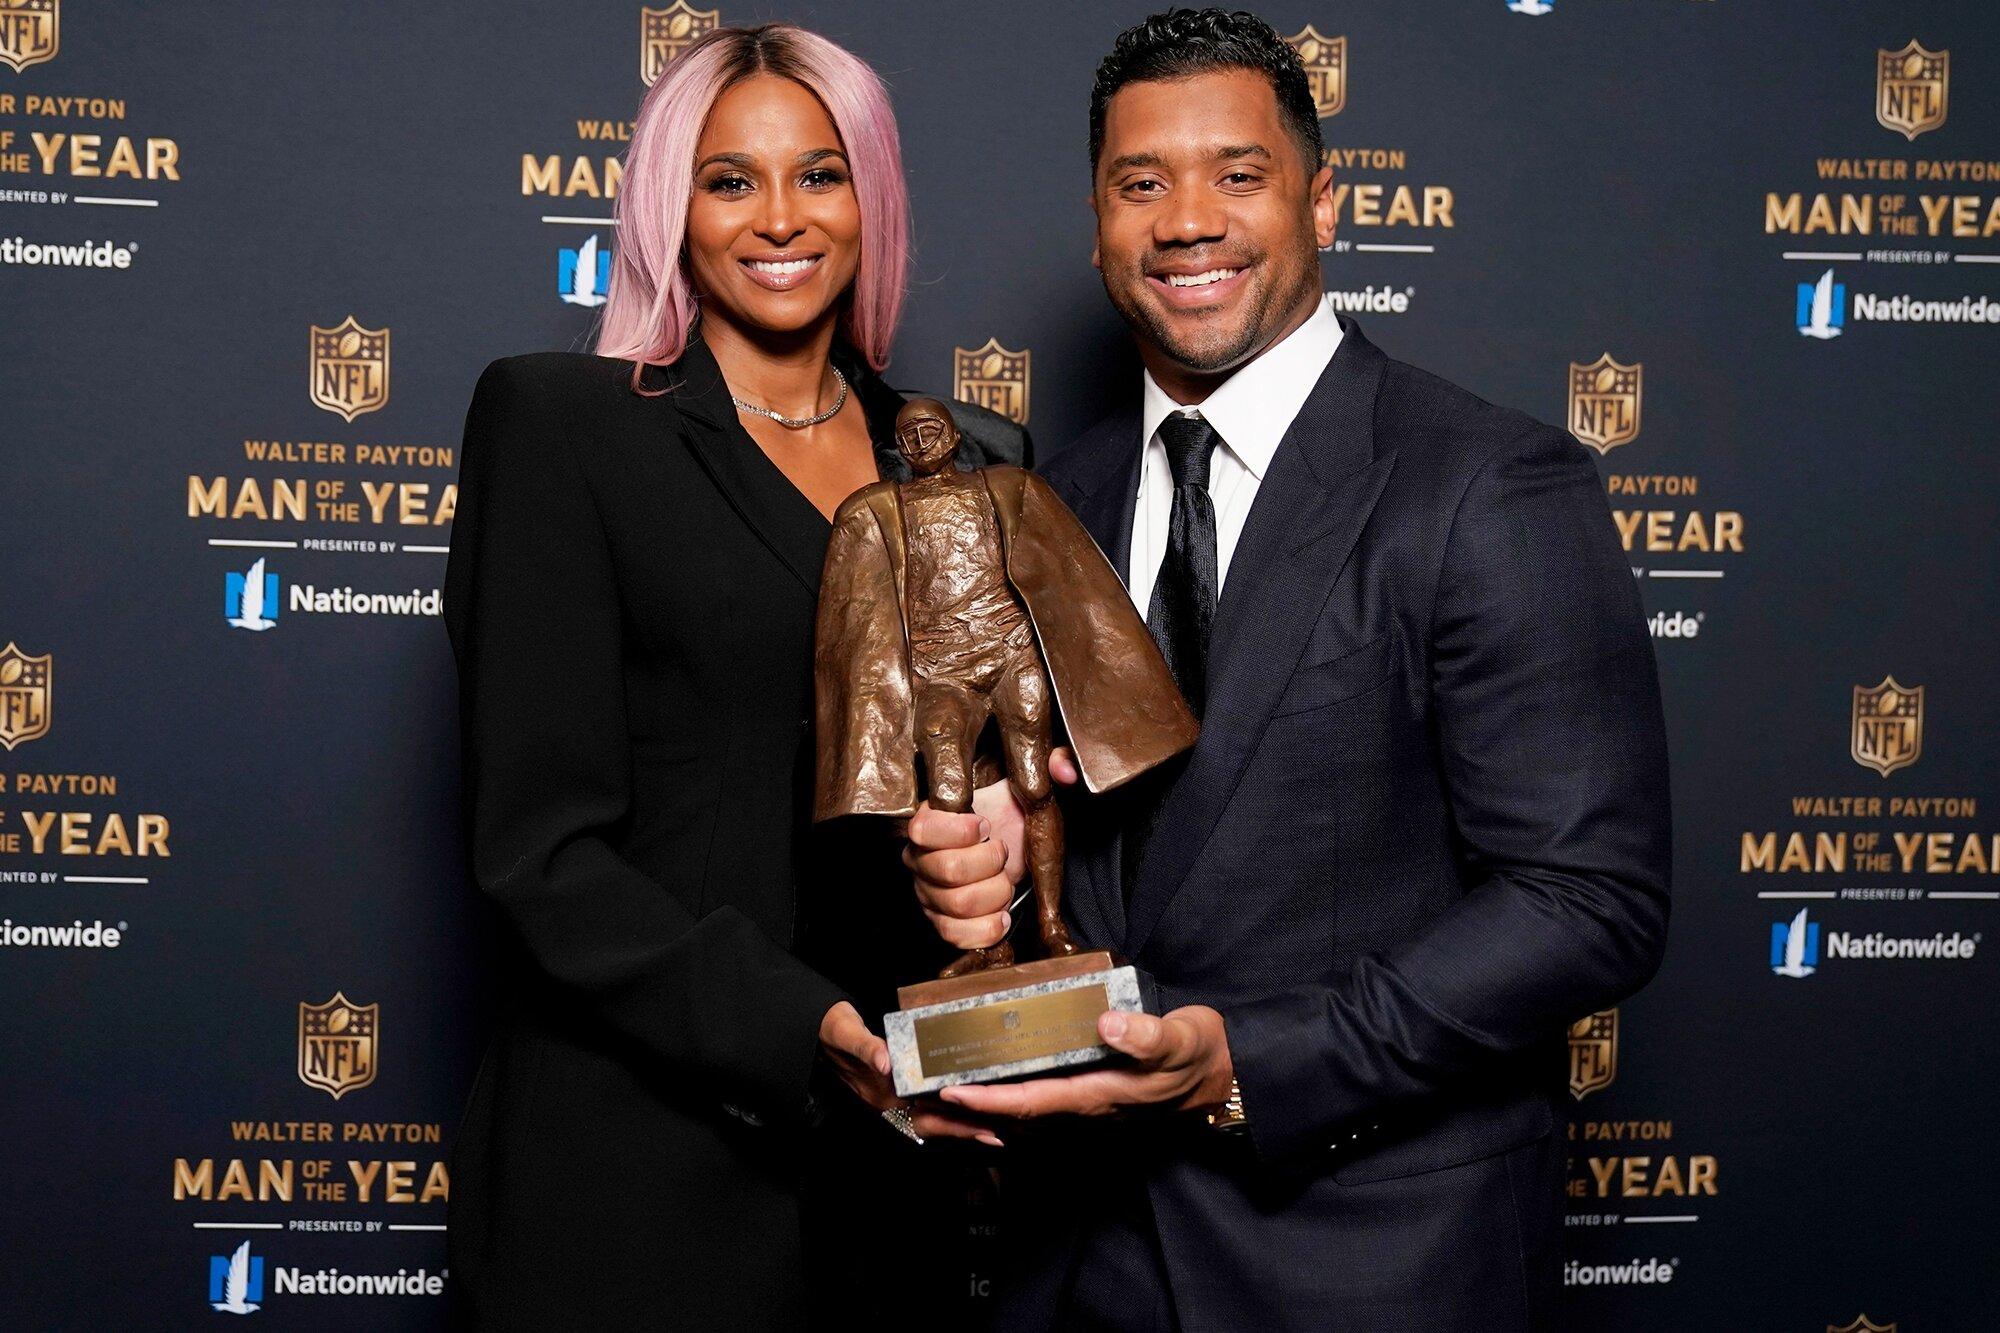 NFL Honors Super Bowl Football, Tampa, United States - 05 Feb 2021